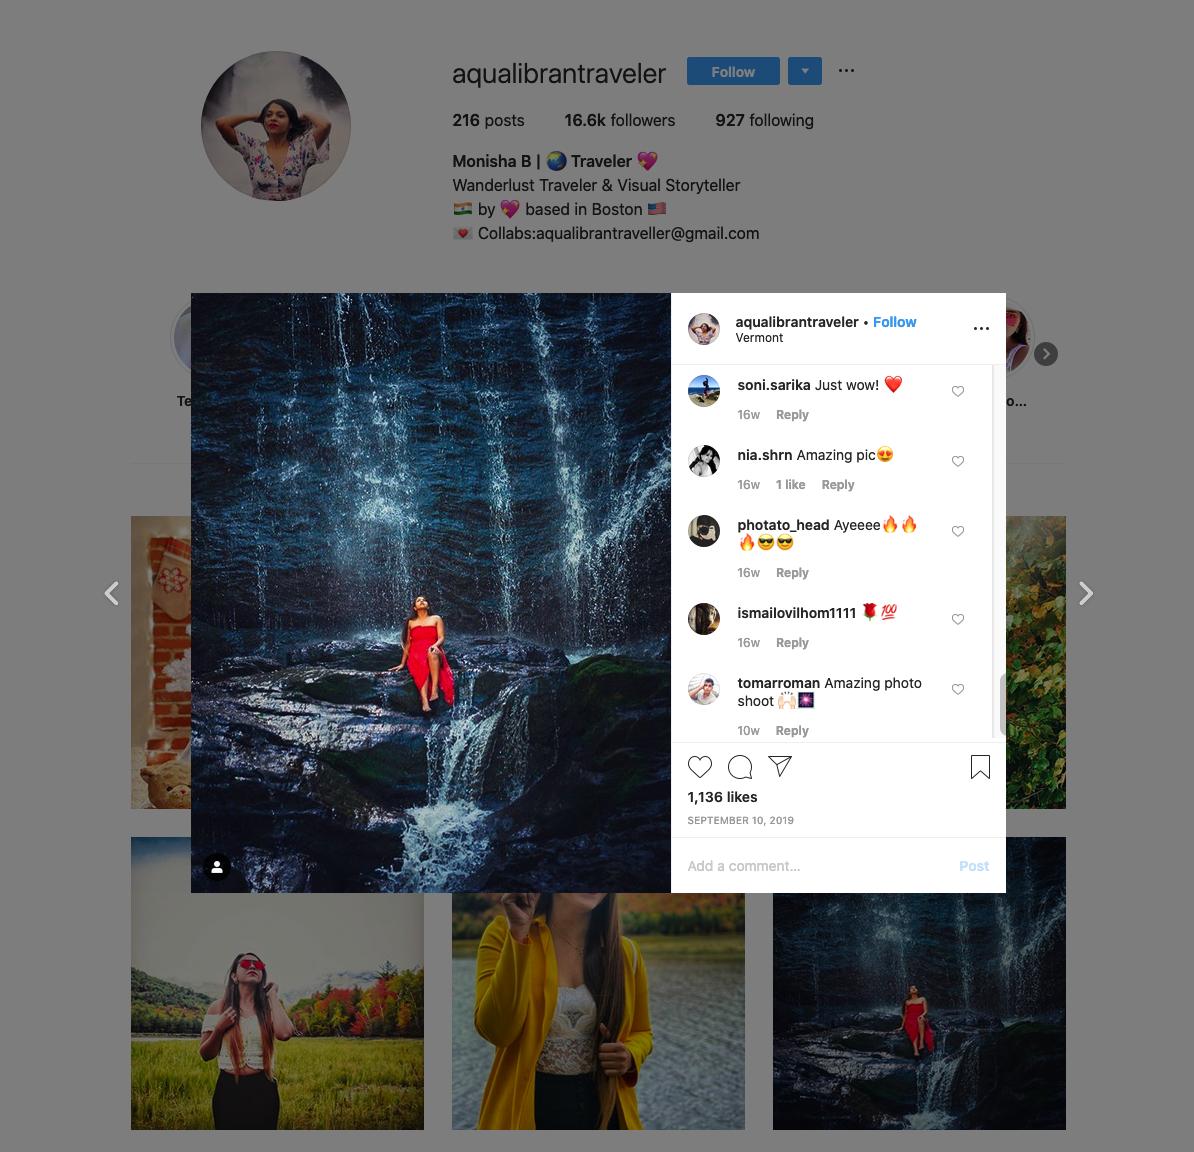 Monisha B | Wanderlust + Visual Storyteller